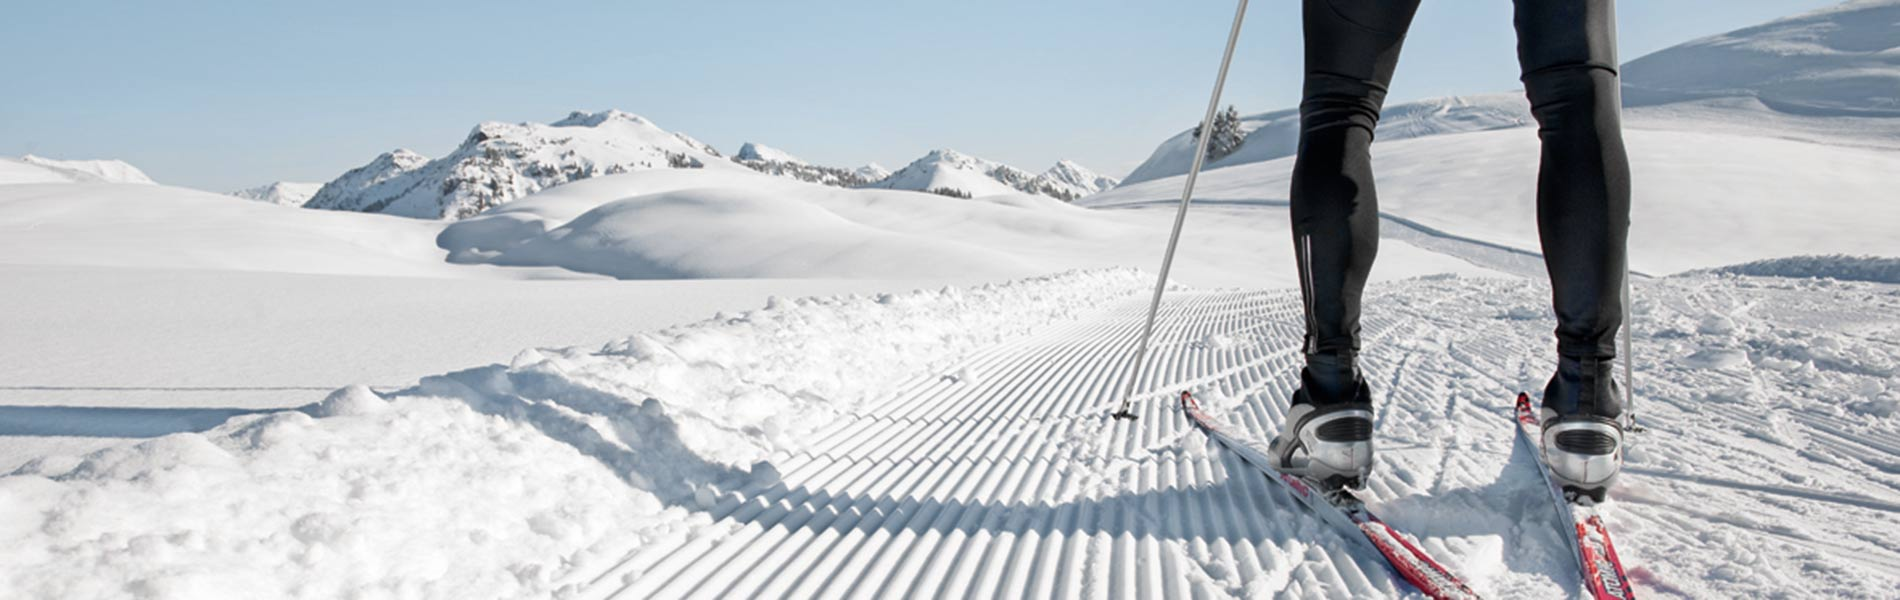 Langlaufen in den Kitzbüheler Alpen Relais & Châteaux Hotel Rosengarten